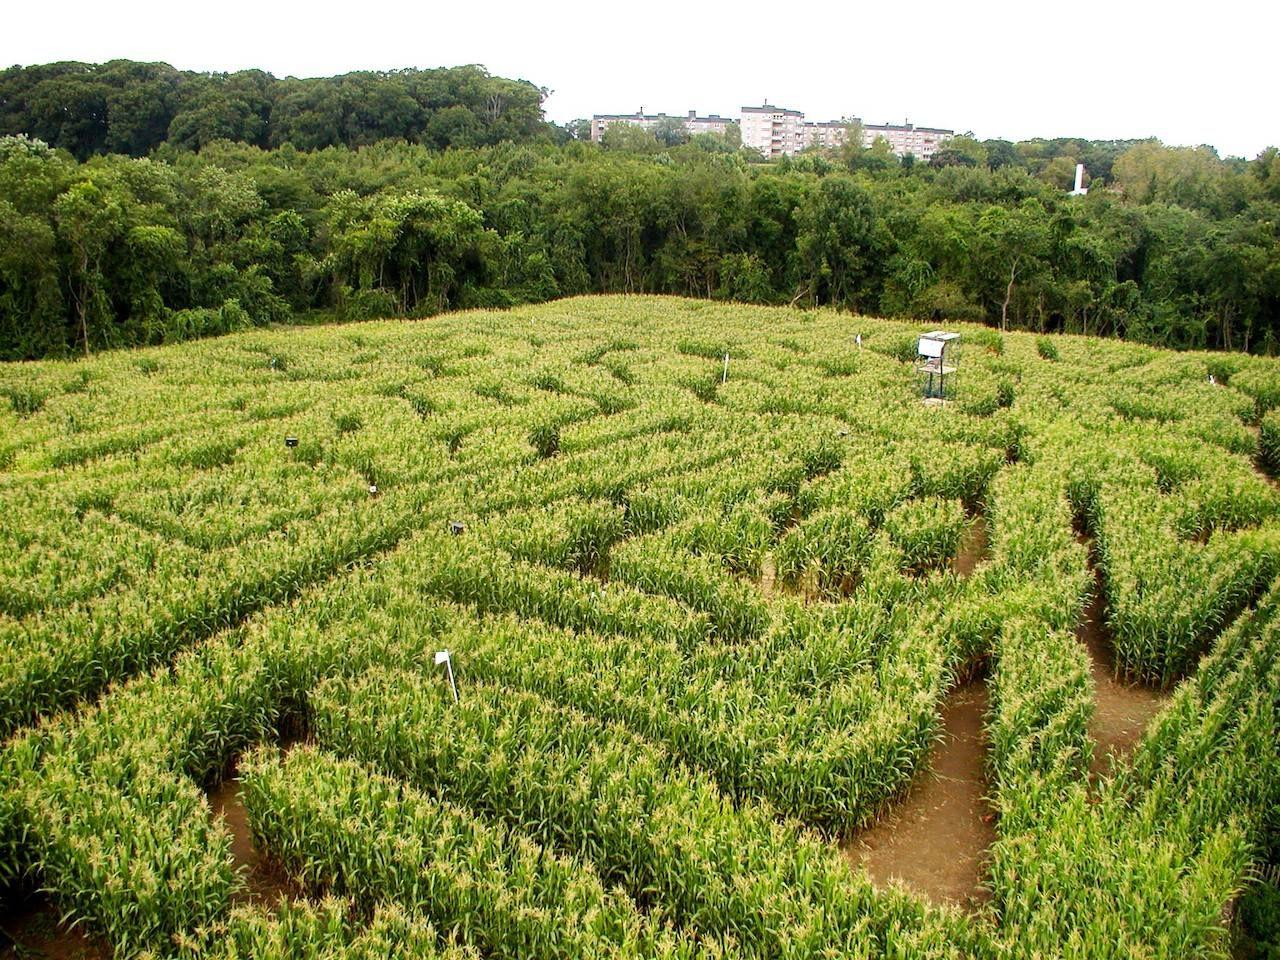 The Queens County Farm Museum corn maze in Queens, New York